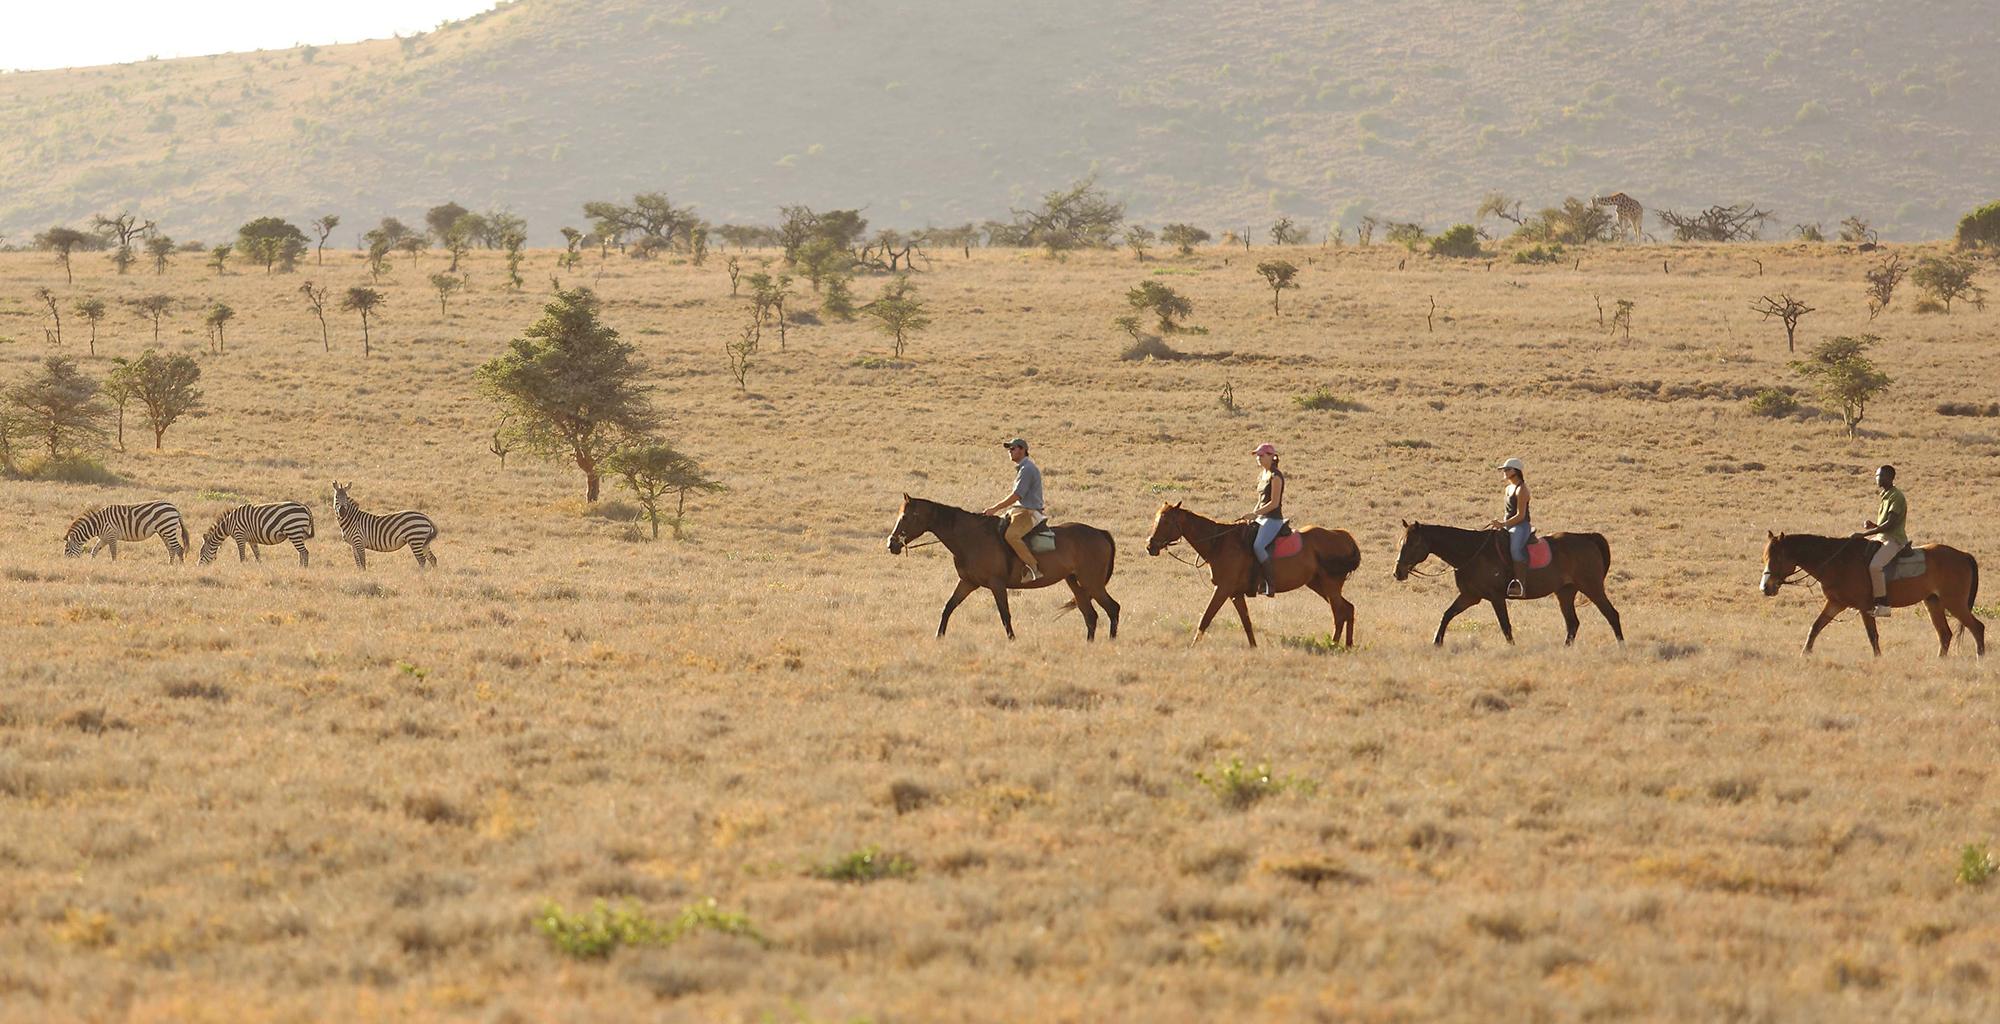 Kenya-Lewa-Wilderness-Horse-Zebra